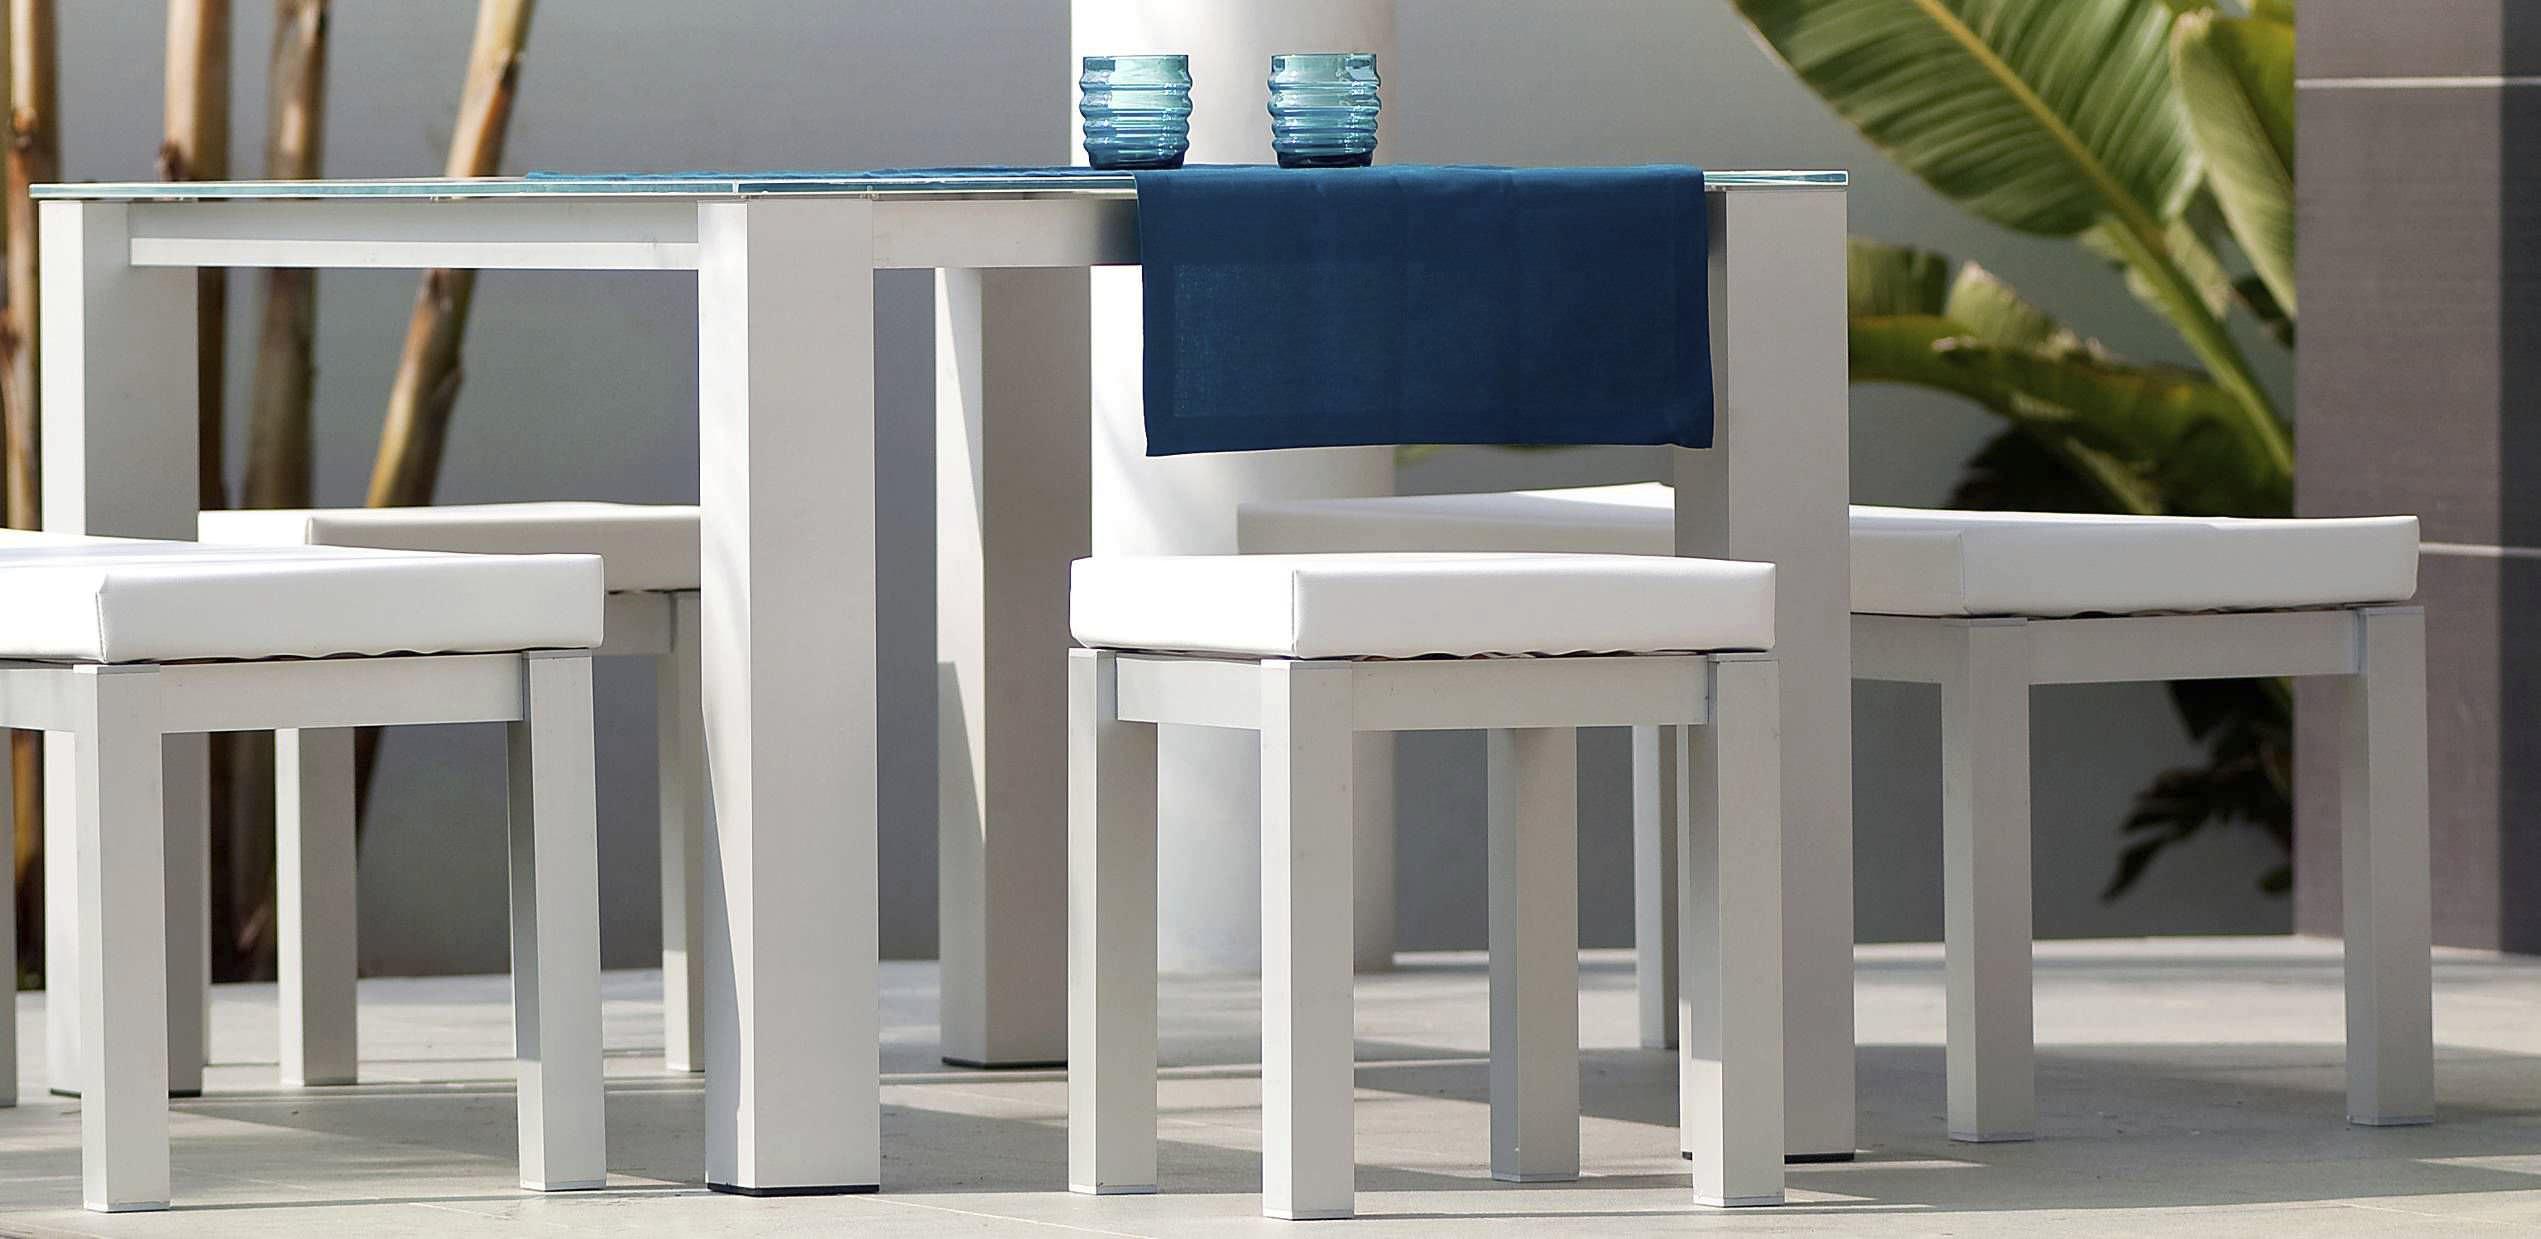 Muebles Tadel Grup - Contemporary Table Wooden Rectangular Garden Laguna Blue [mjhdah]http://img.archiexpo.com/images_ae/photo-g/54536-5594993.jpg